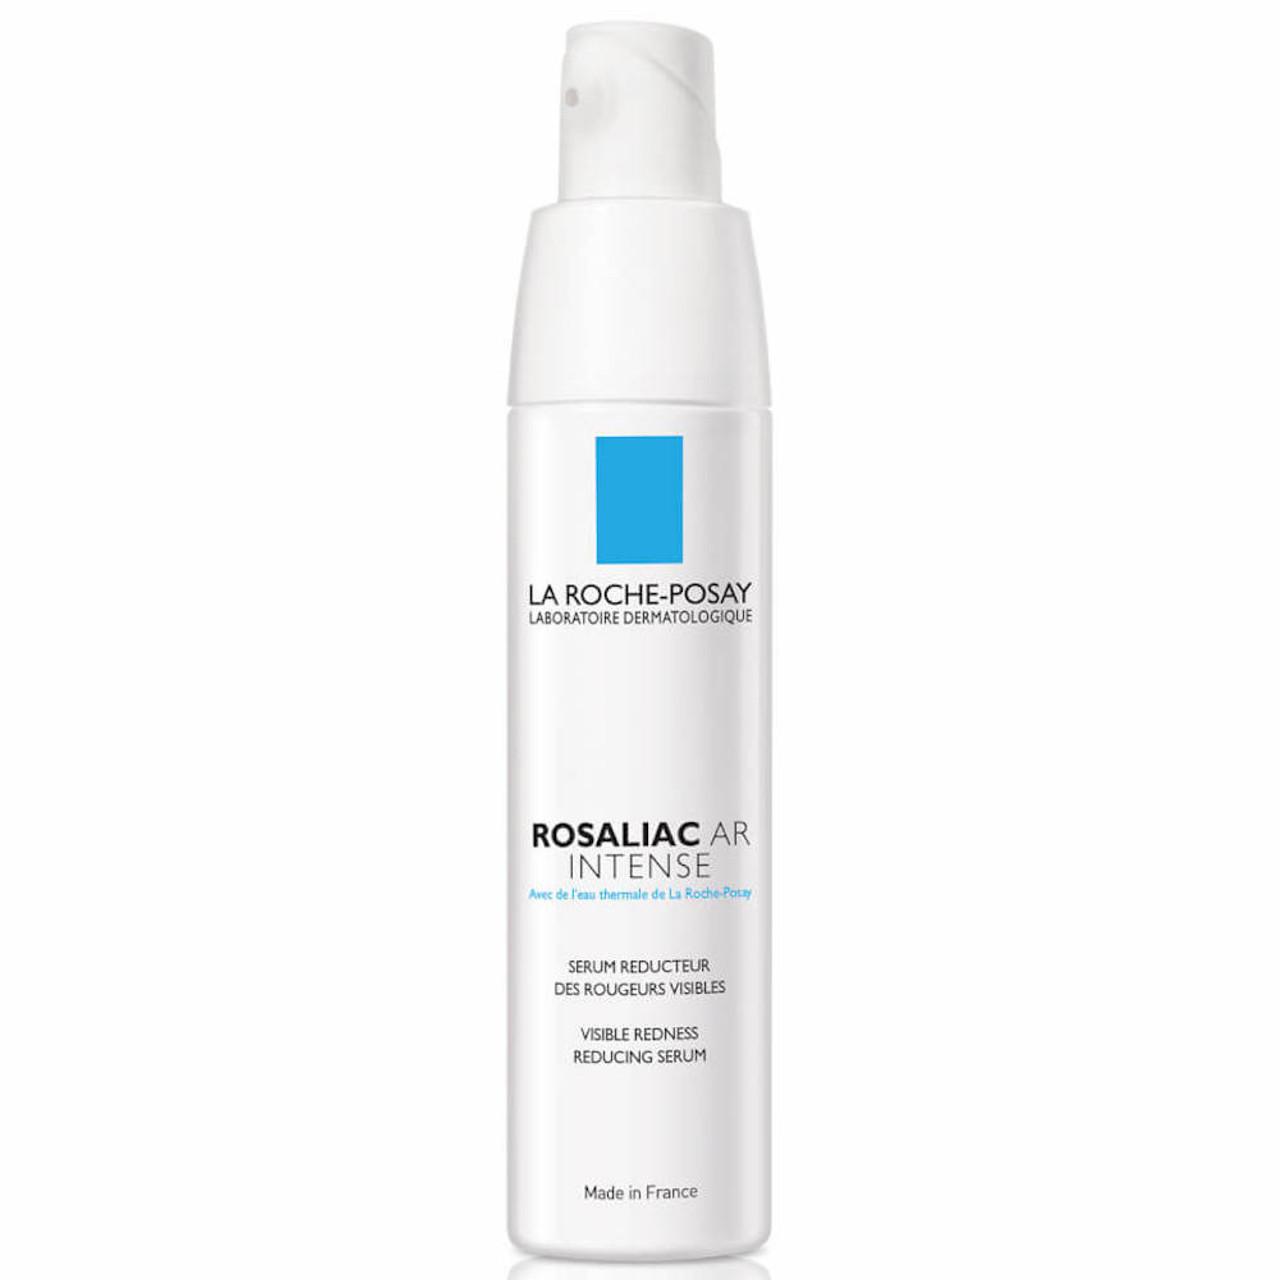 La Roche Posay Rosaliac AR Intense Visible Redness Reducing Serum BeautifiedYou.com